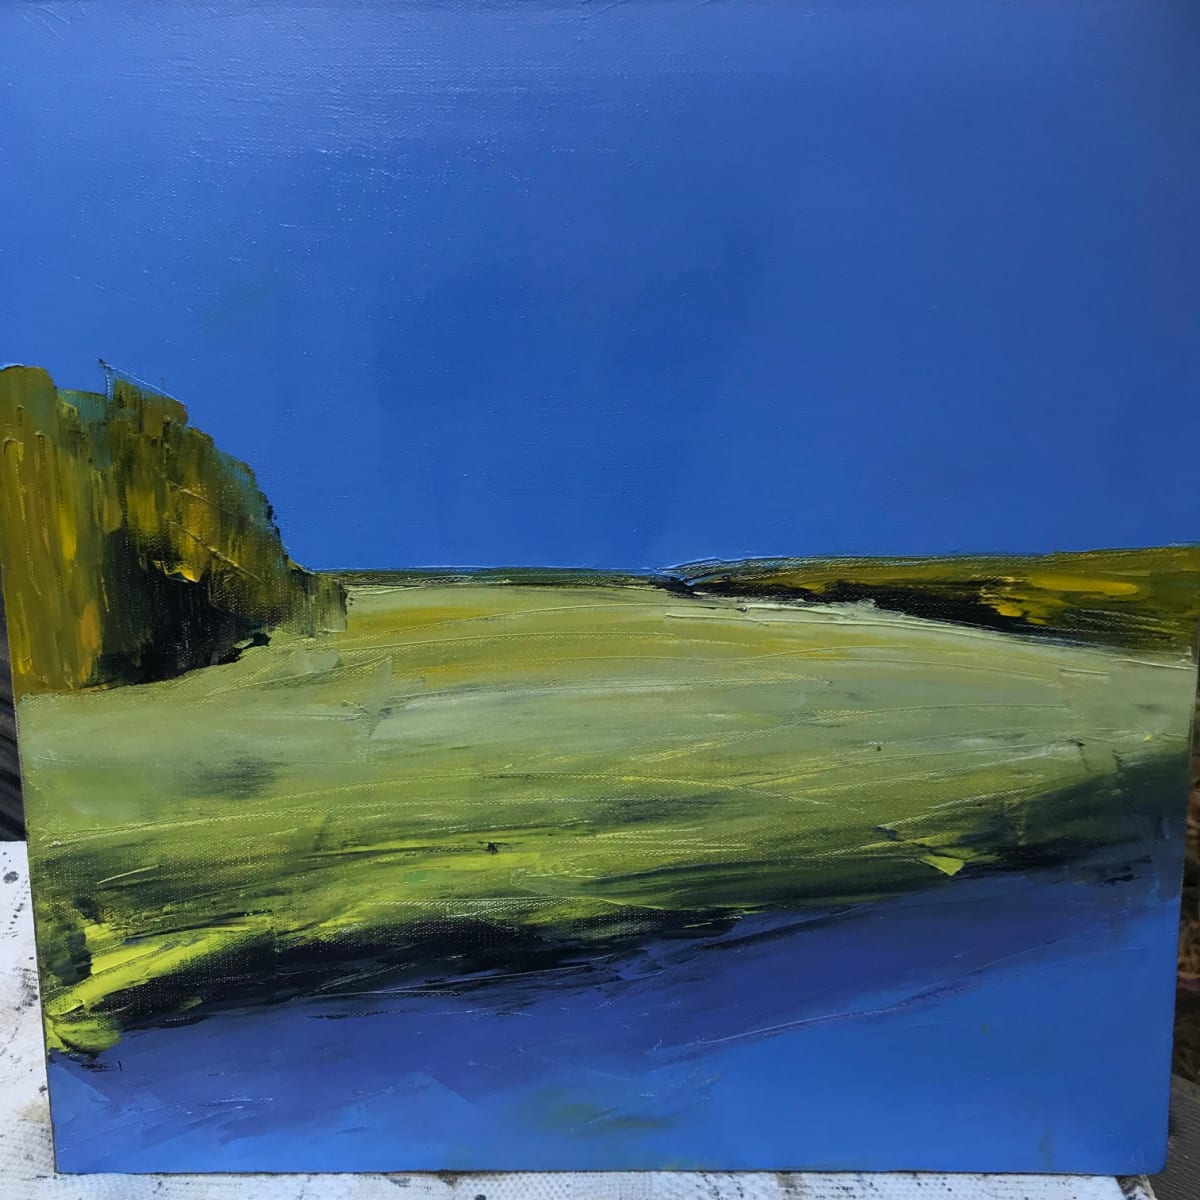 River Banks + Grasses